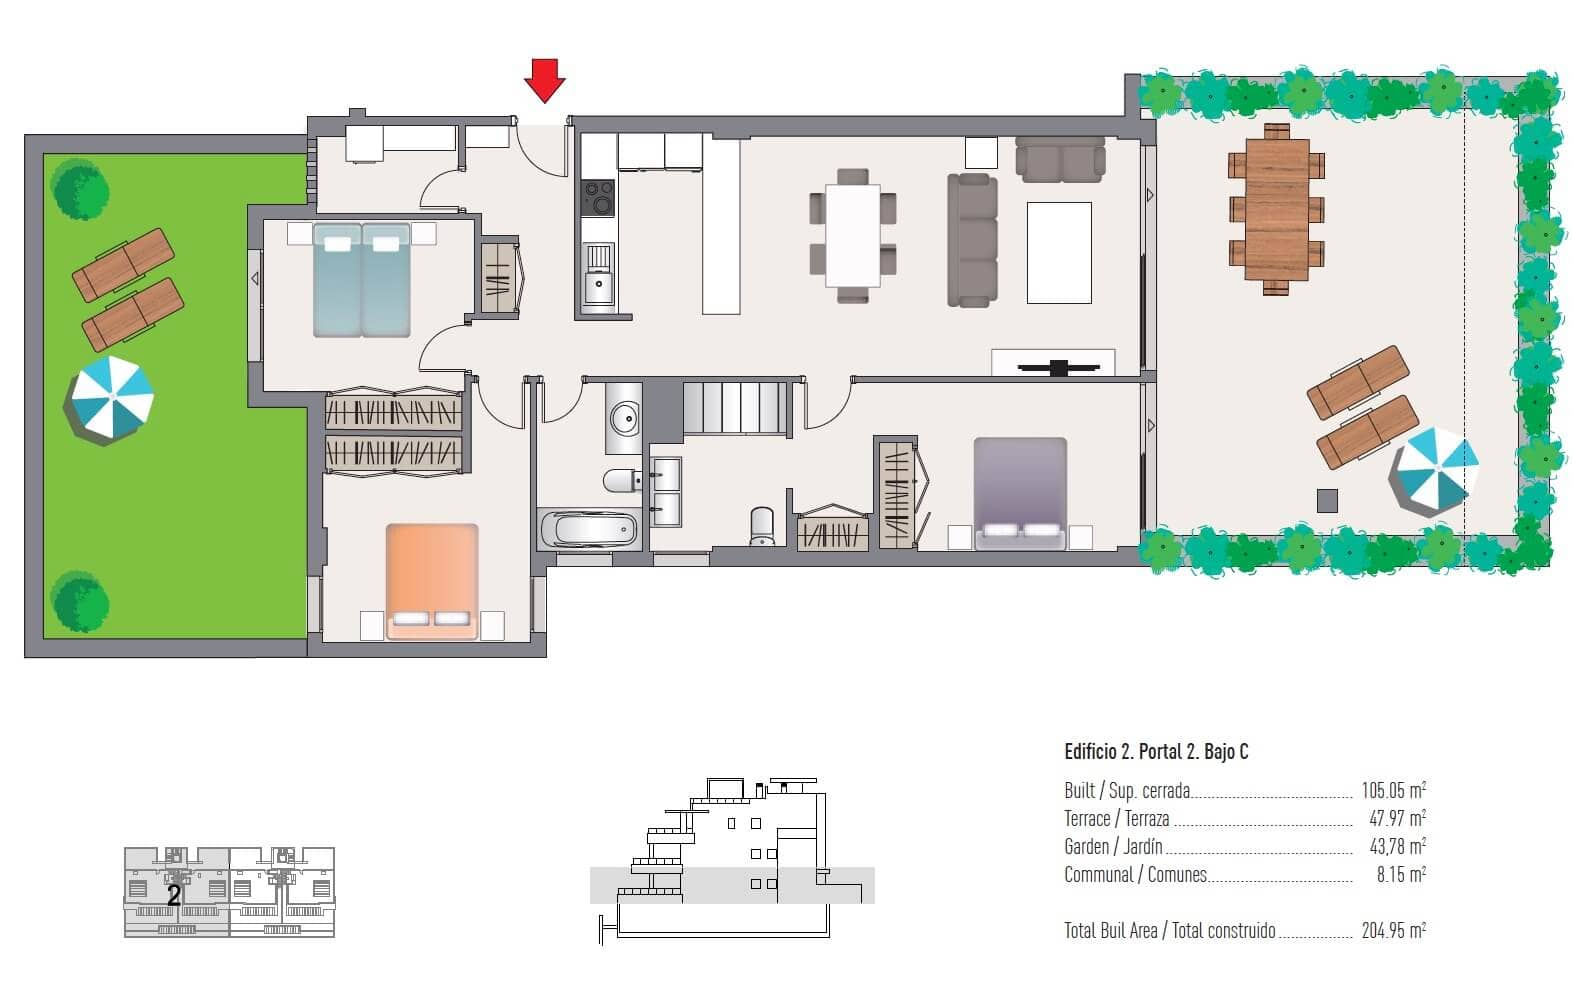 las olas estepona appartement te koop grondplan 3 slaapkamers